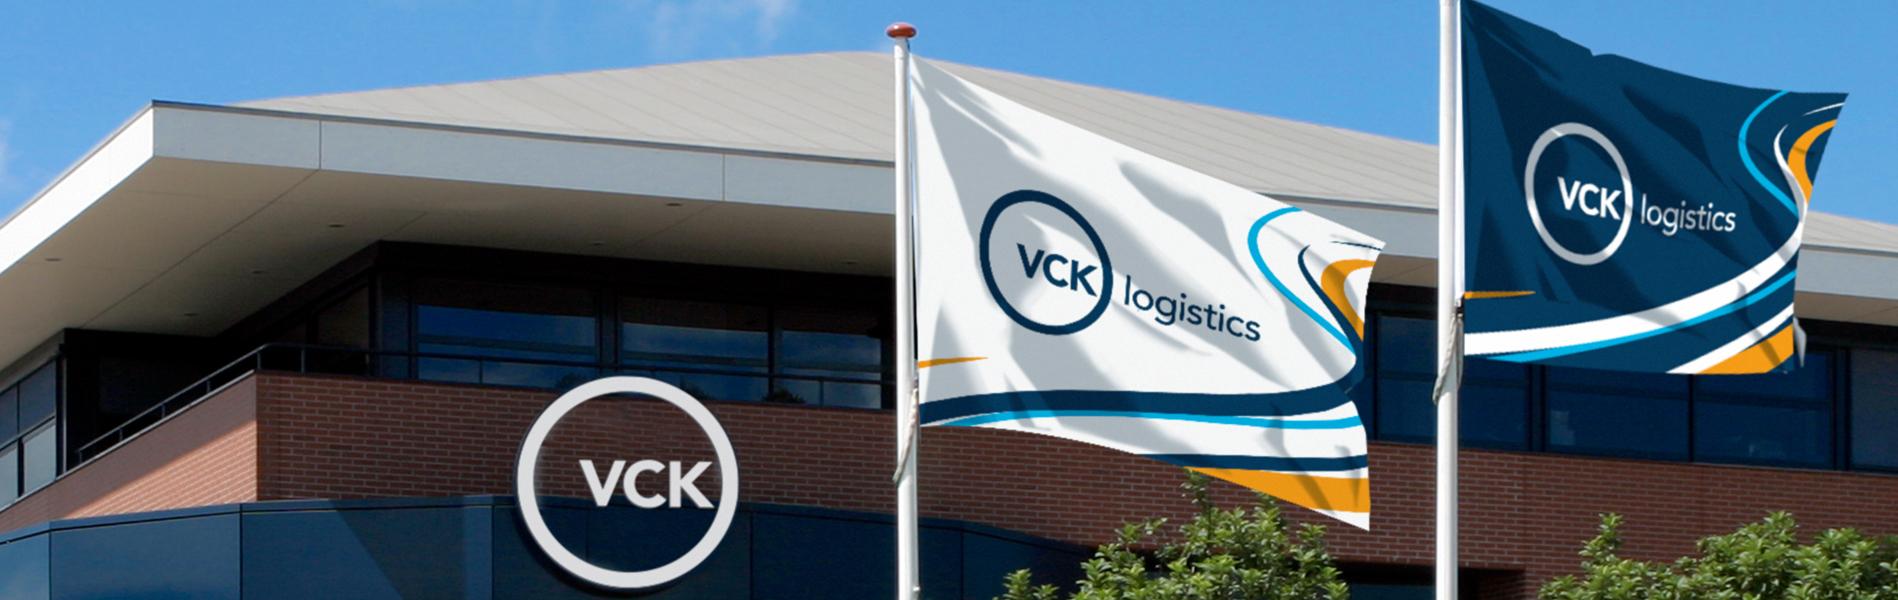 VCK-banner